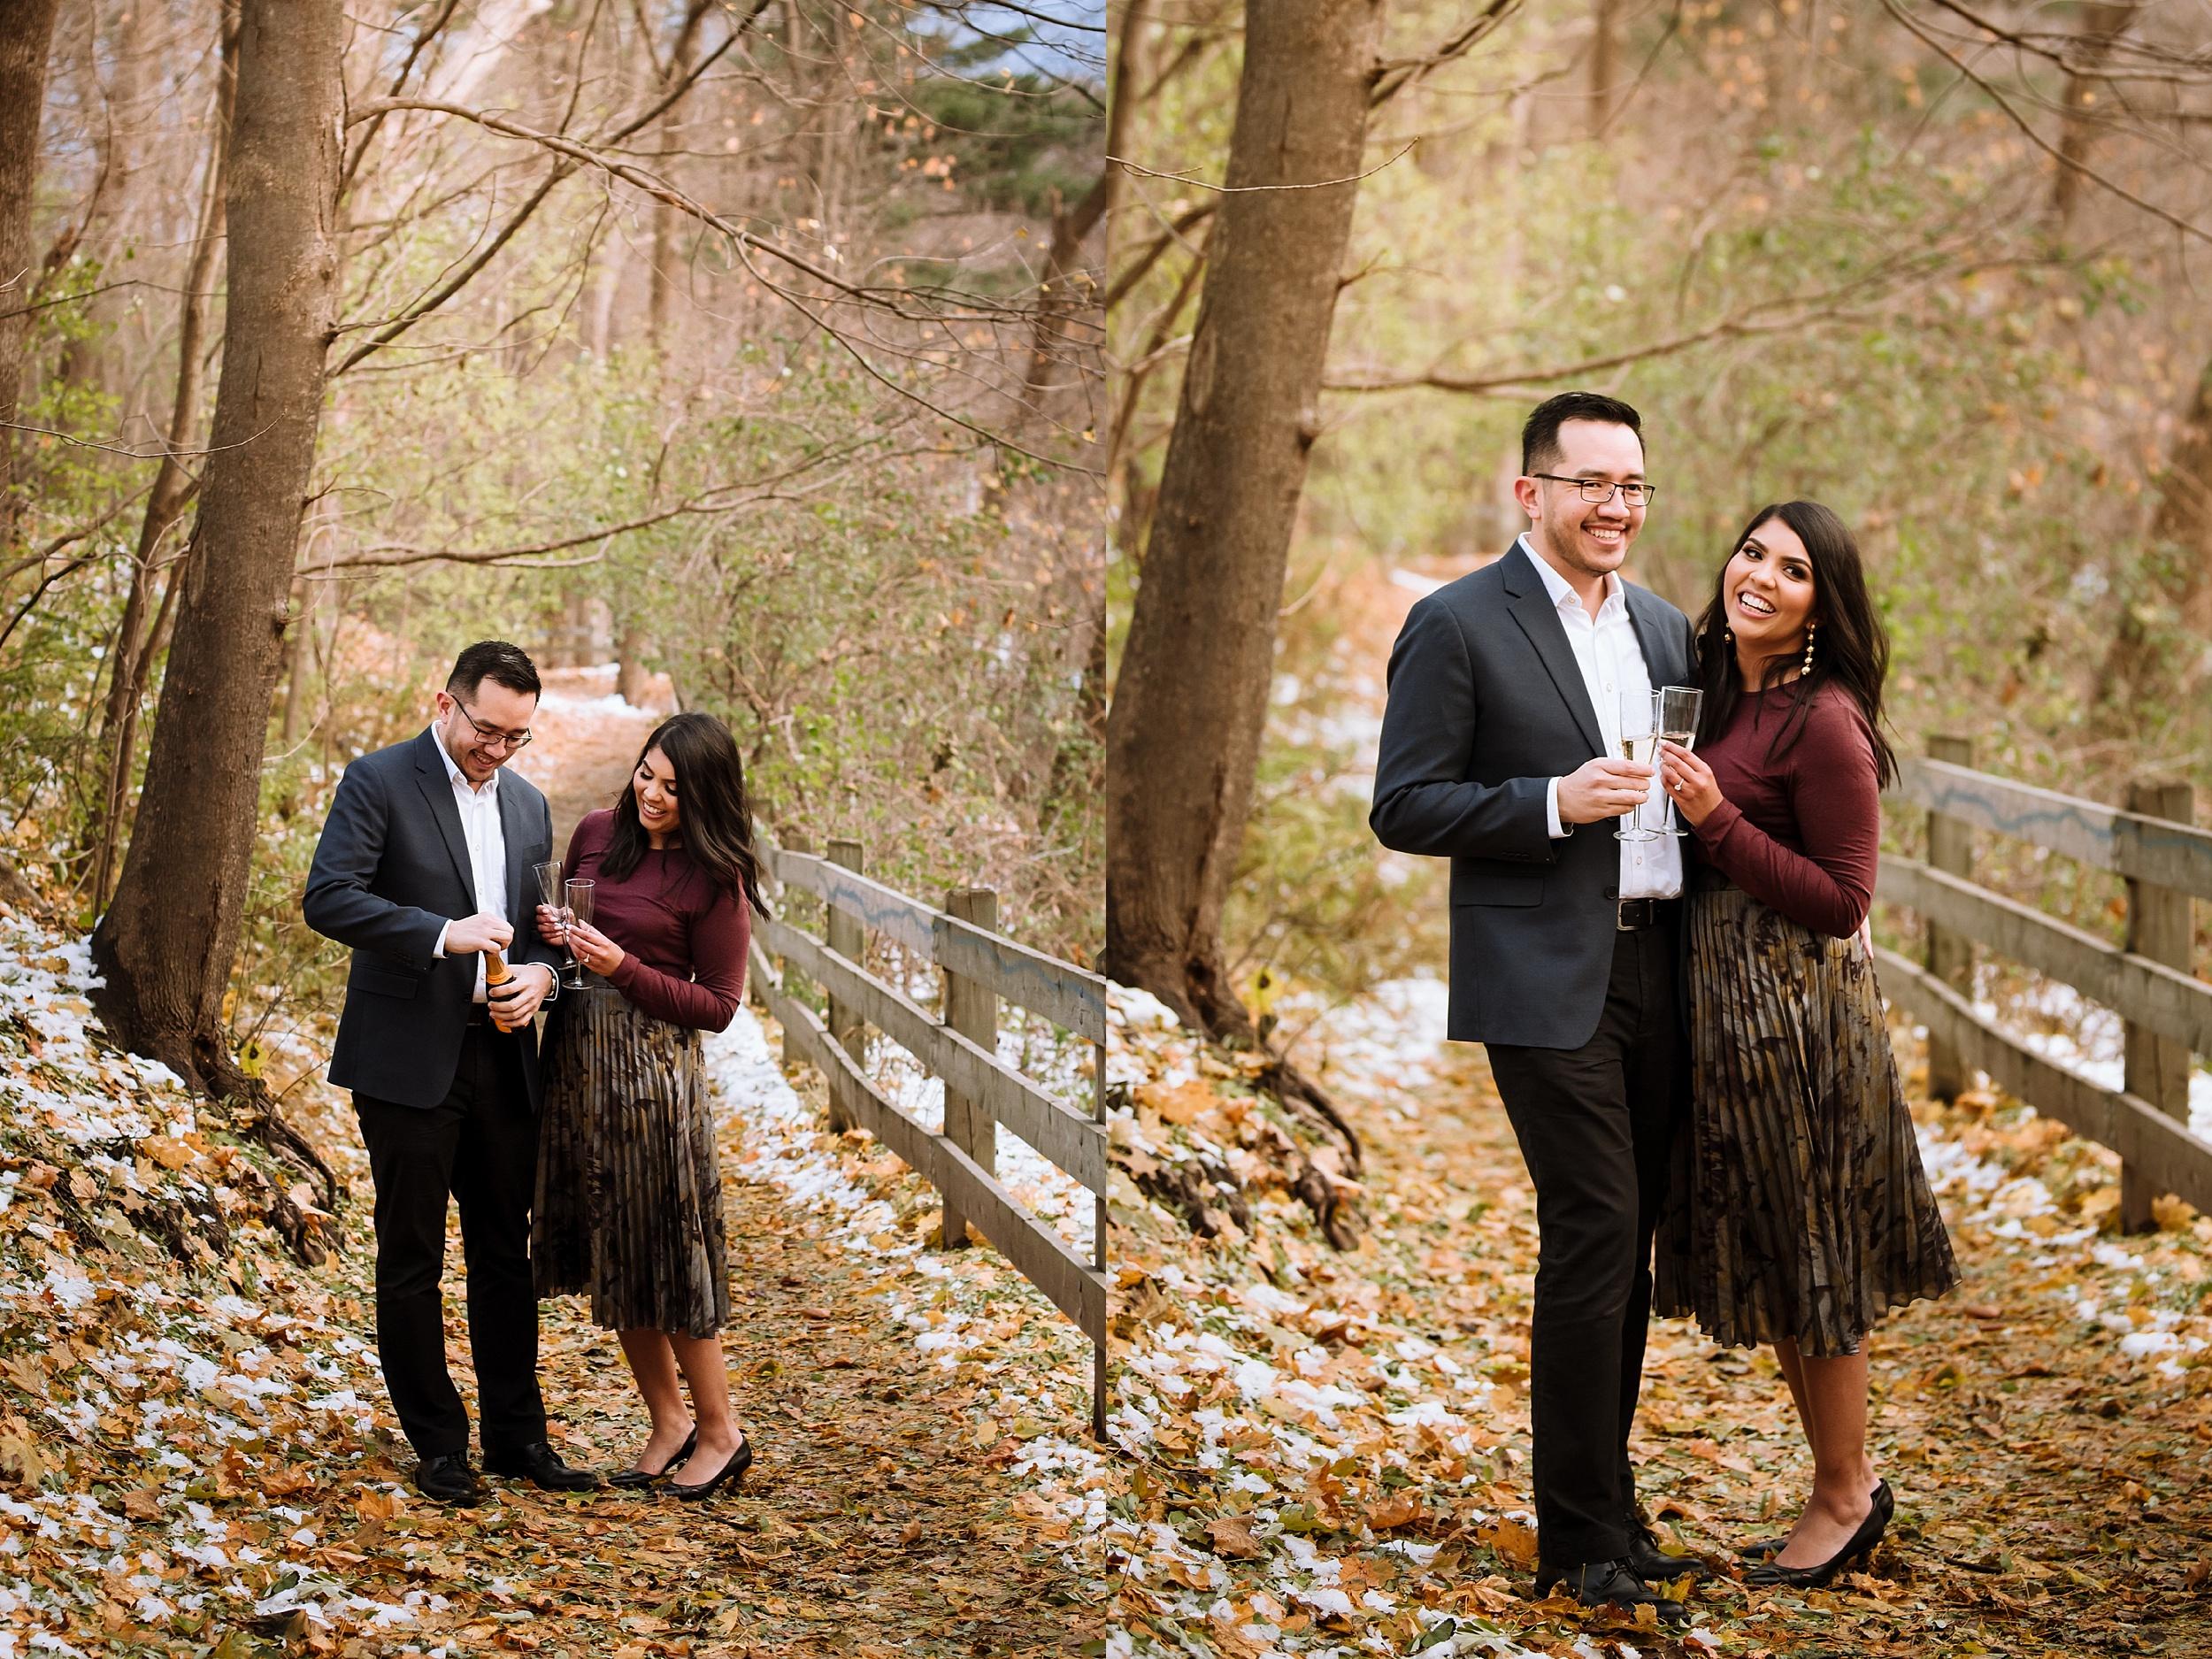 Alexander_Muir_Memorial_Gardens_Engagement_Shoot_Toronto_Wedding_Photographer_0022.jpg